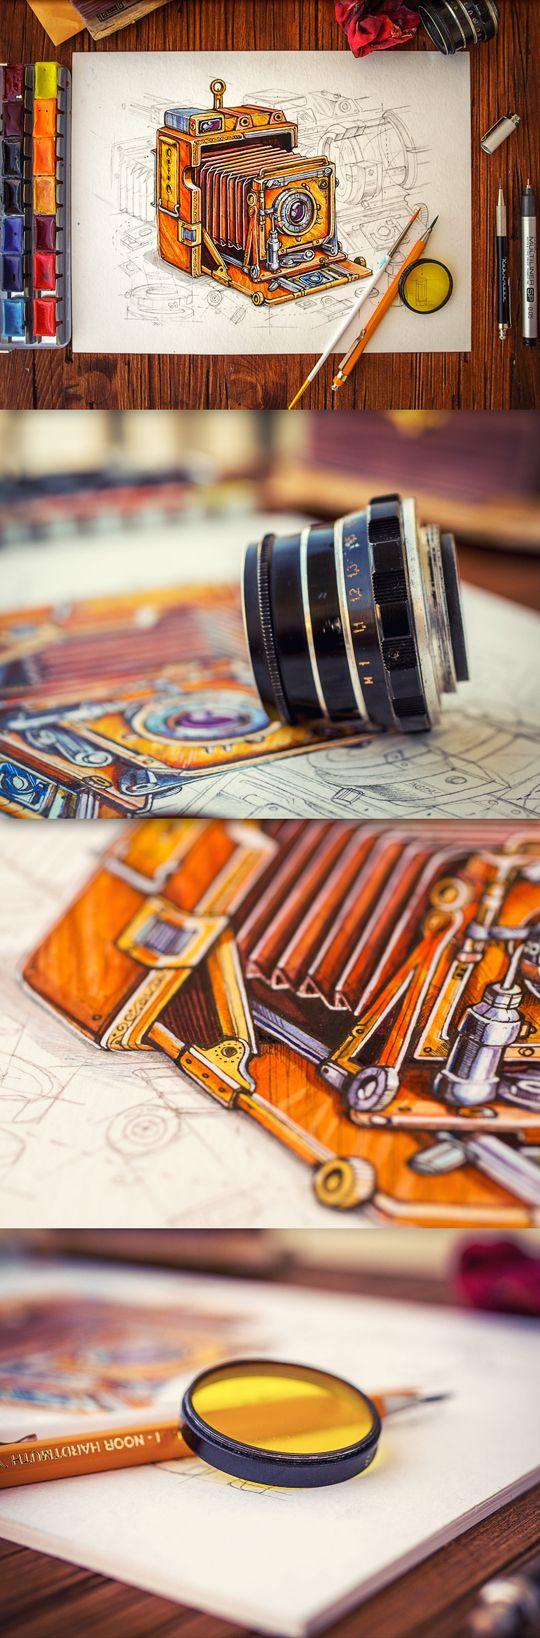 Steampunk 2012-2013 by Mike , via Behance